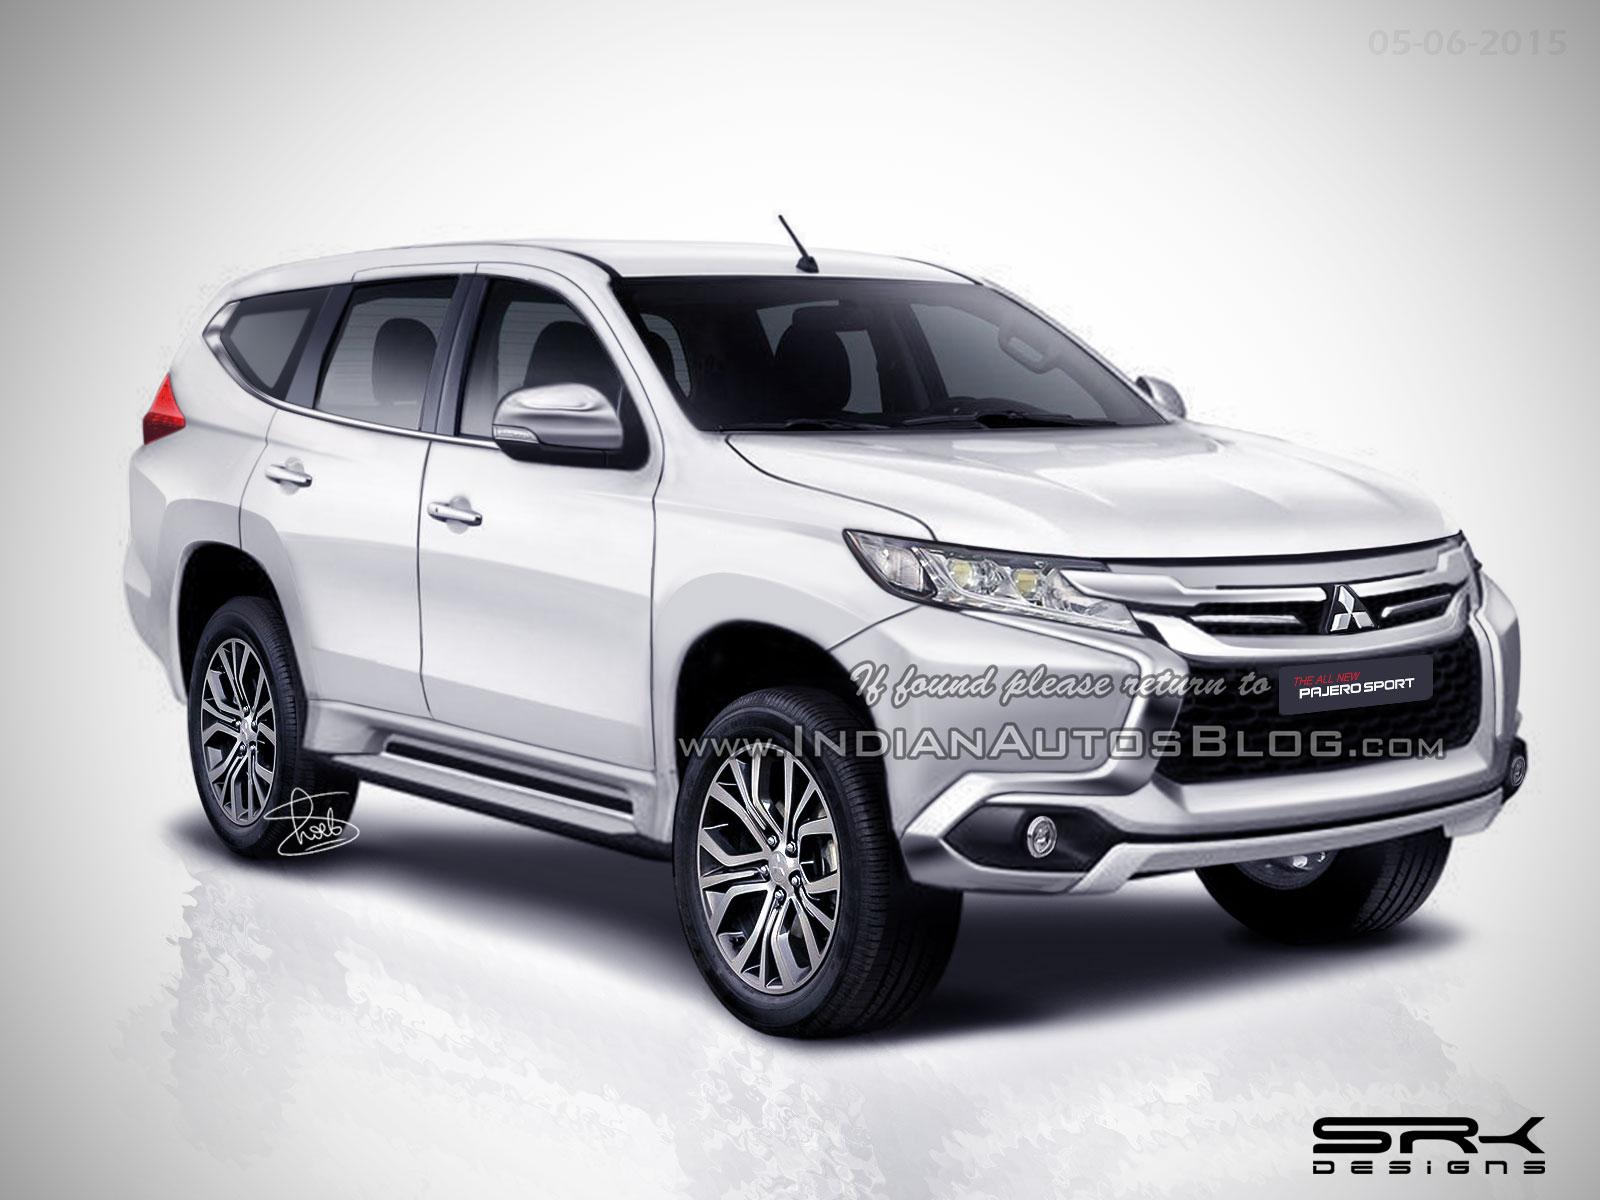 2016-Mitsubishi-Pajero-Sport-rendering